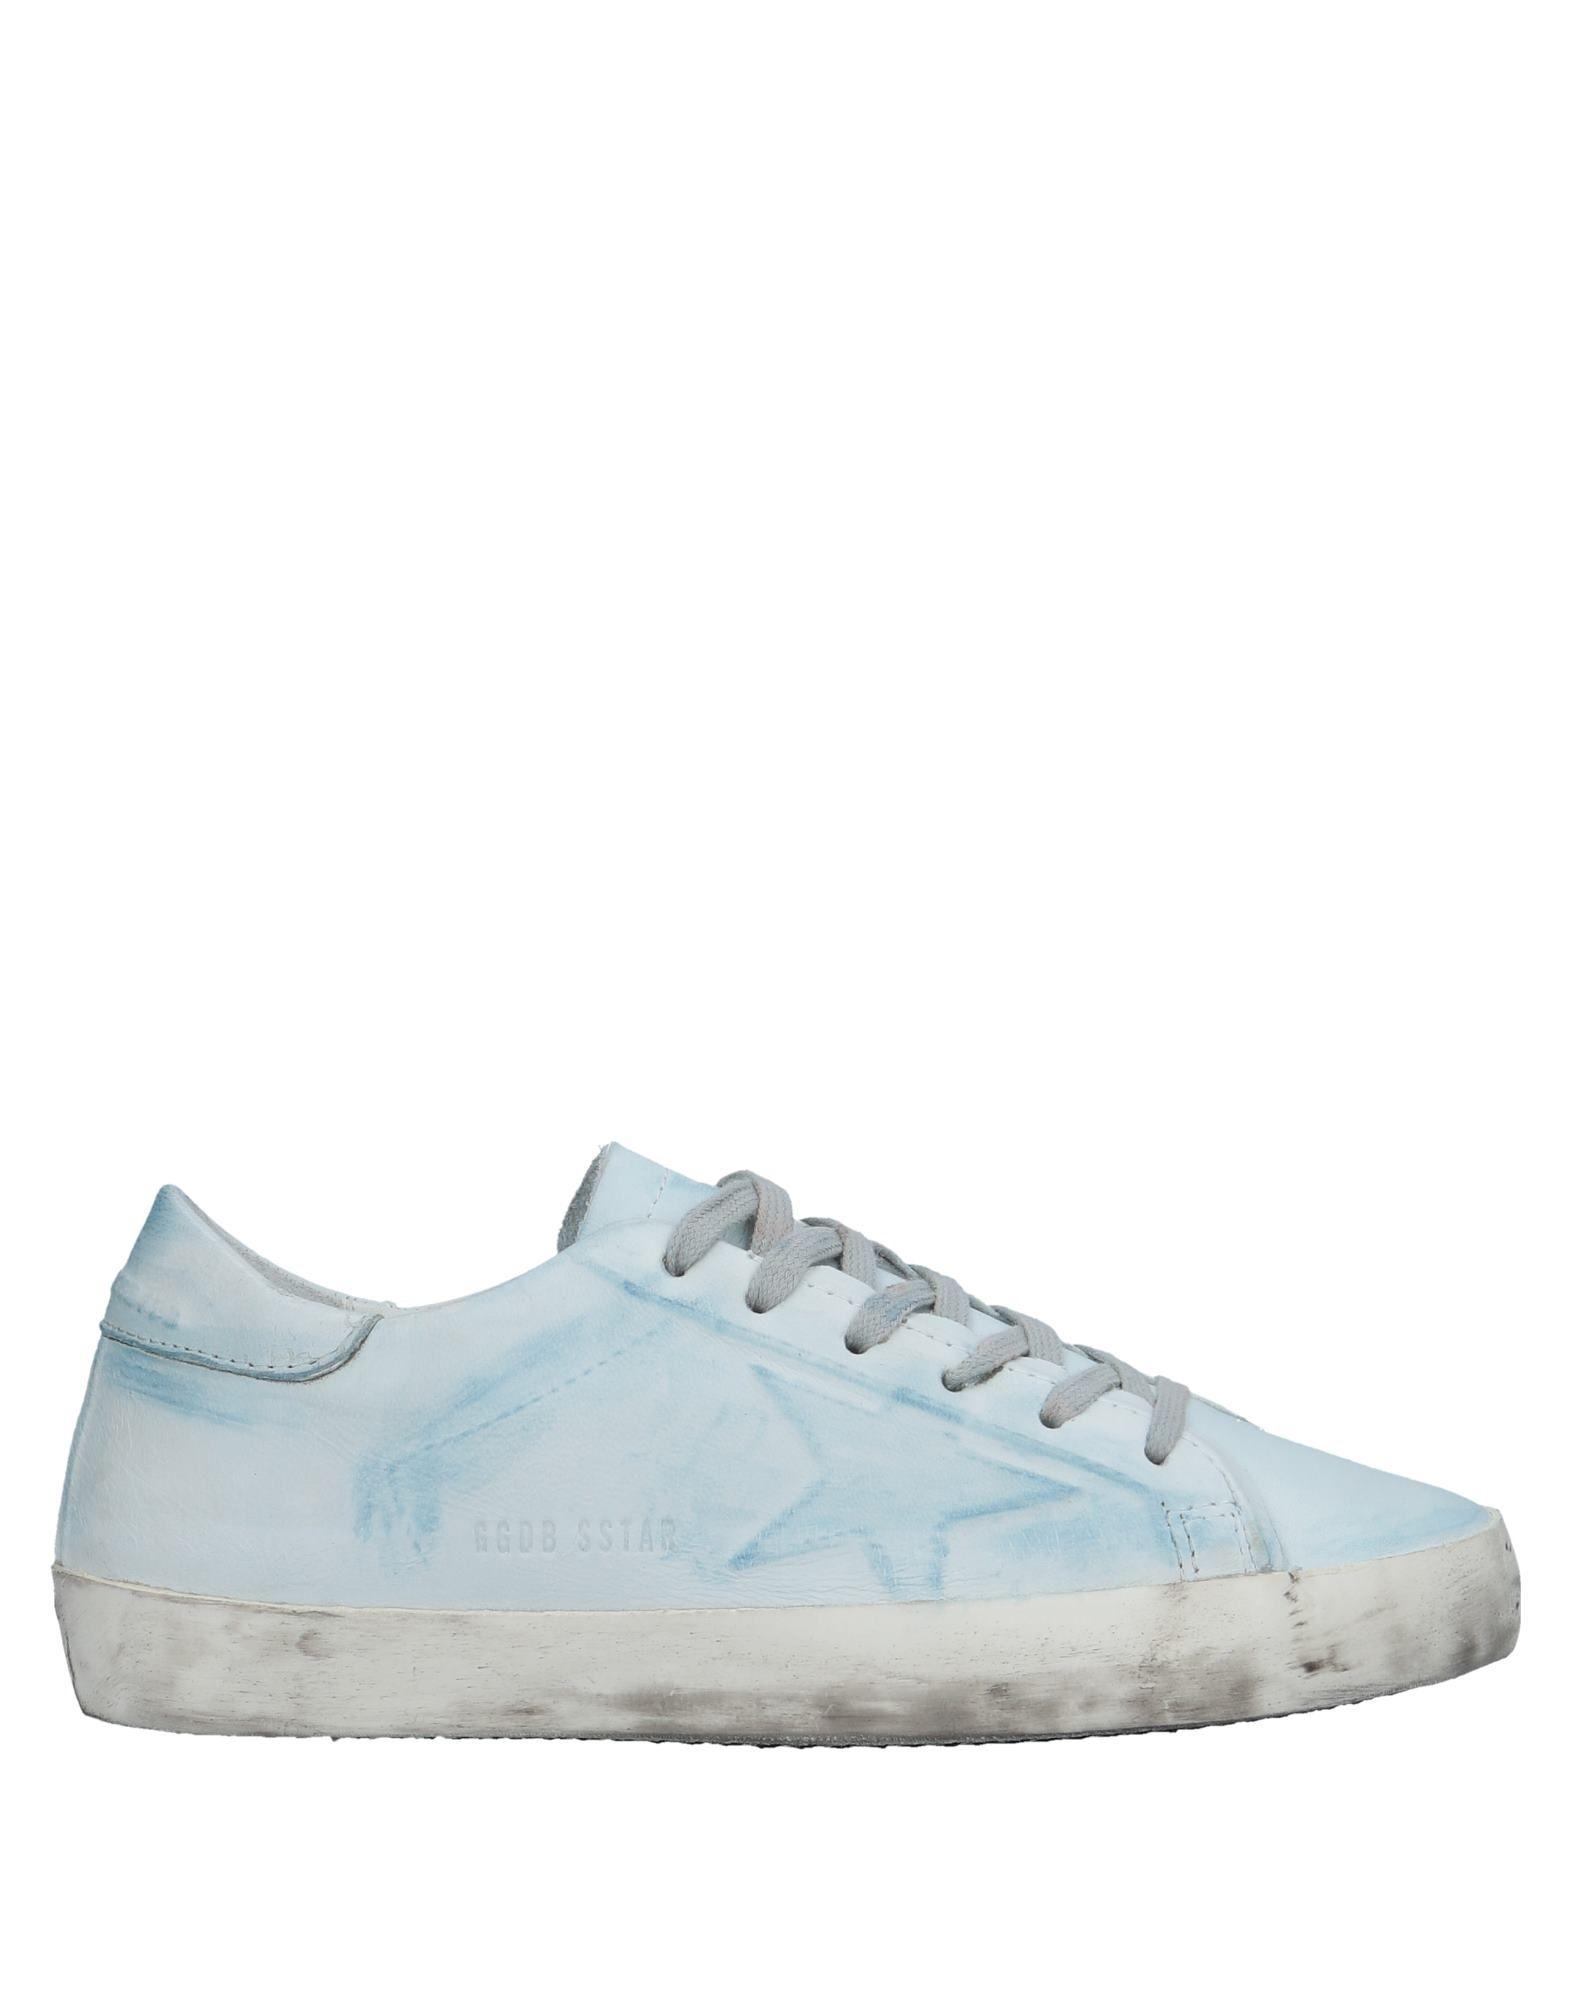 4b7febaee golden goose deluxe brand calzado sneakers   deportivas on yoox.com azul